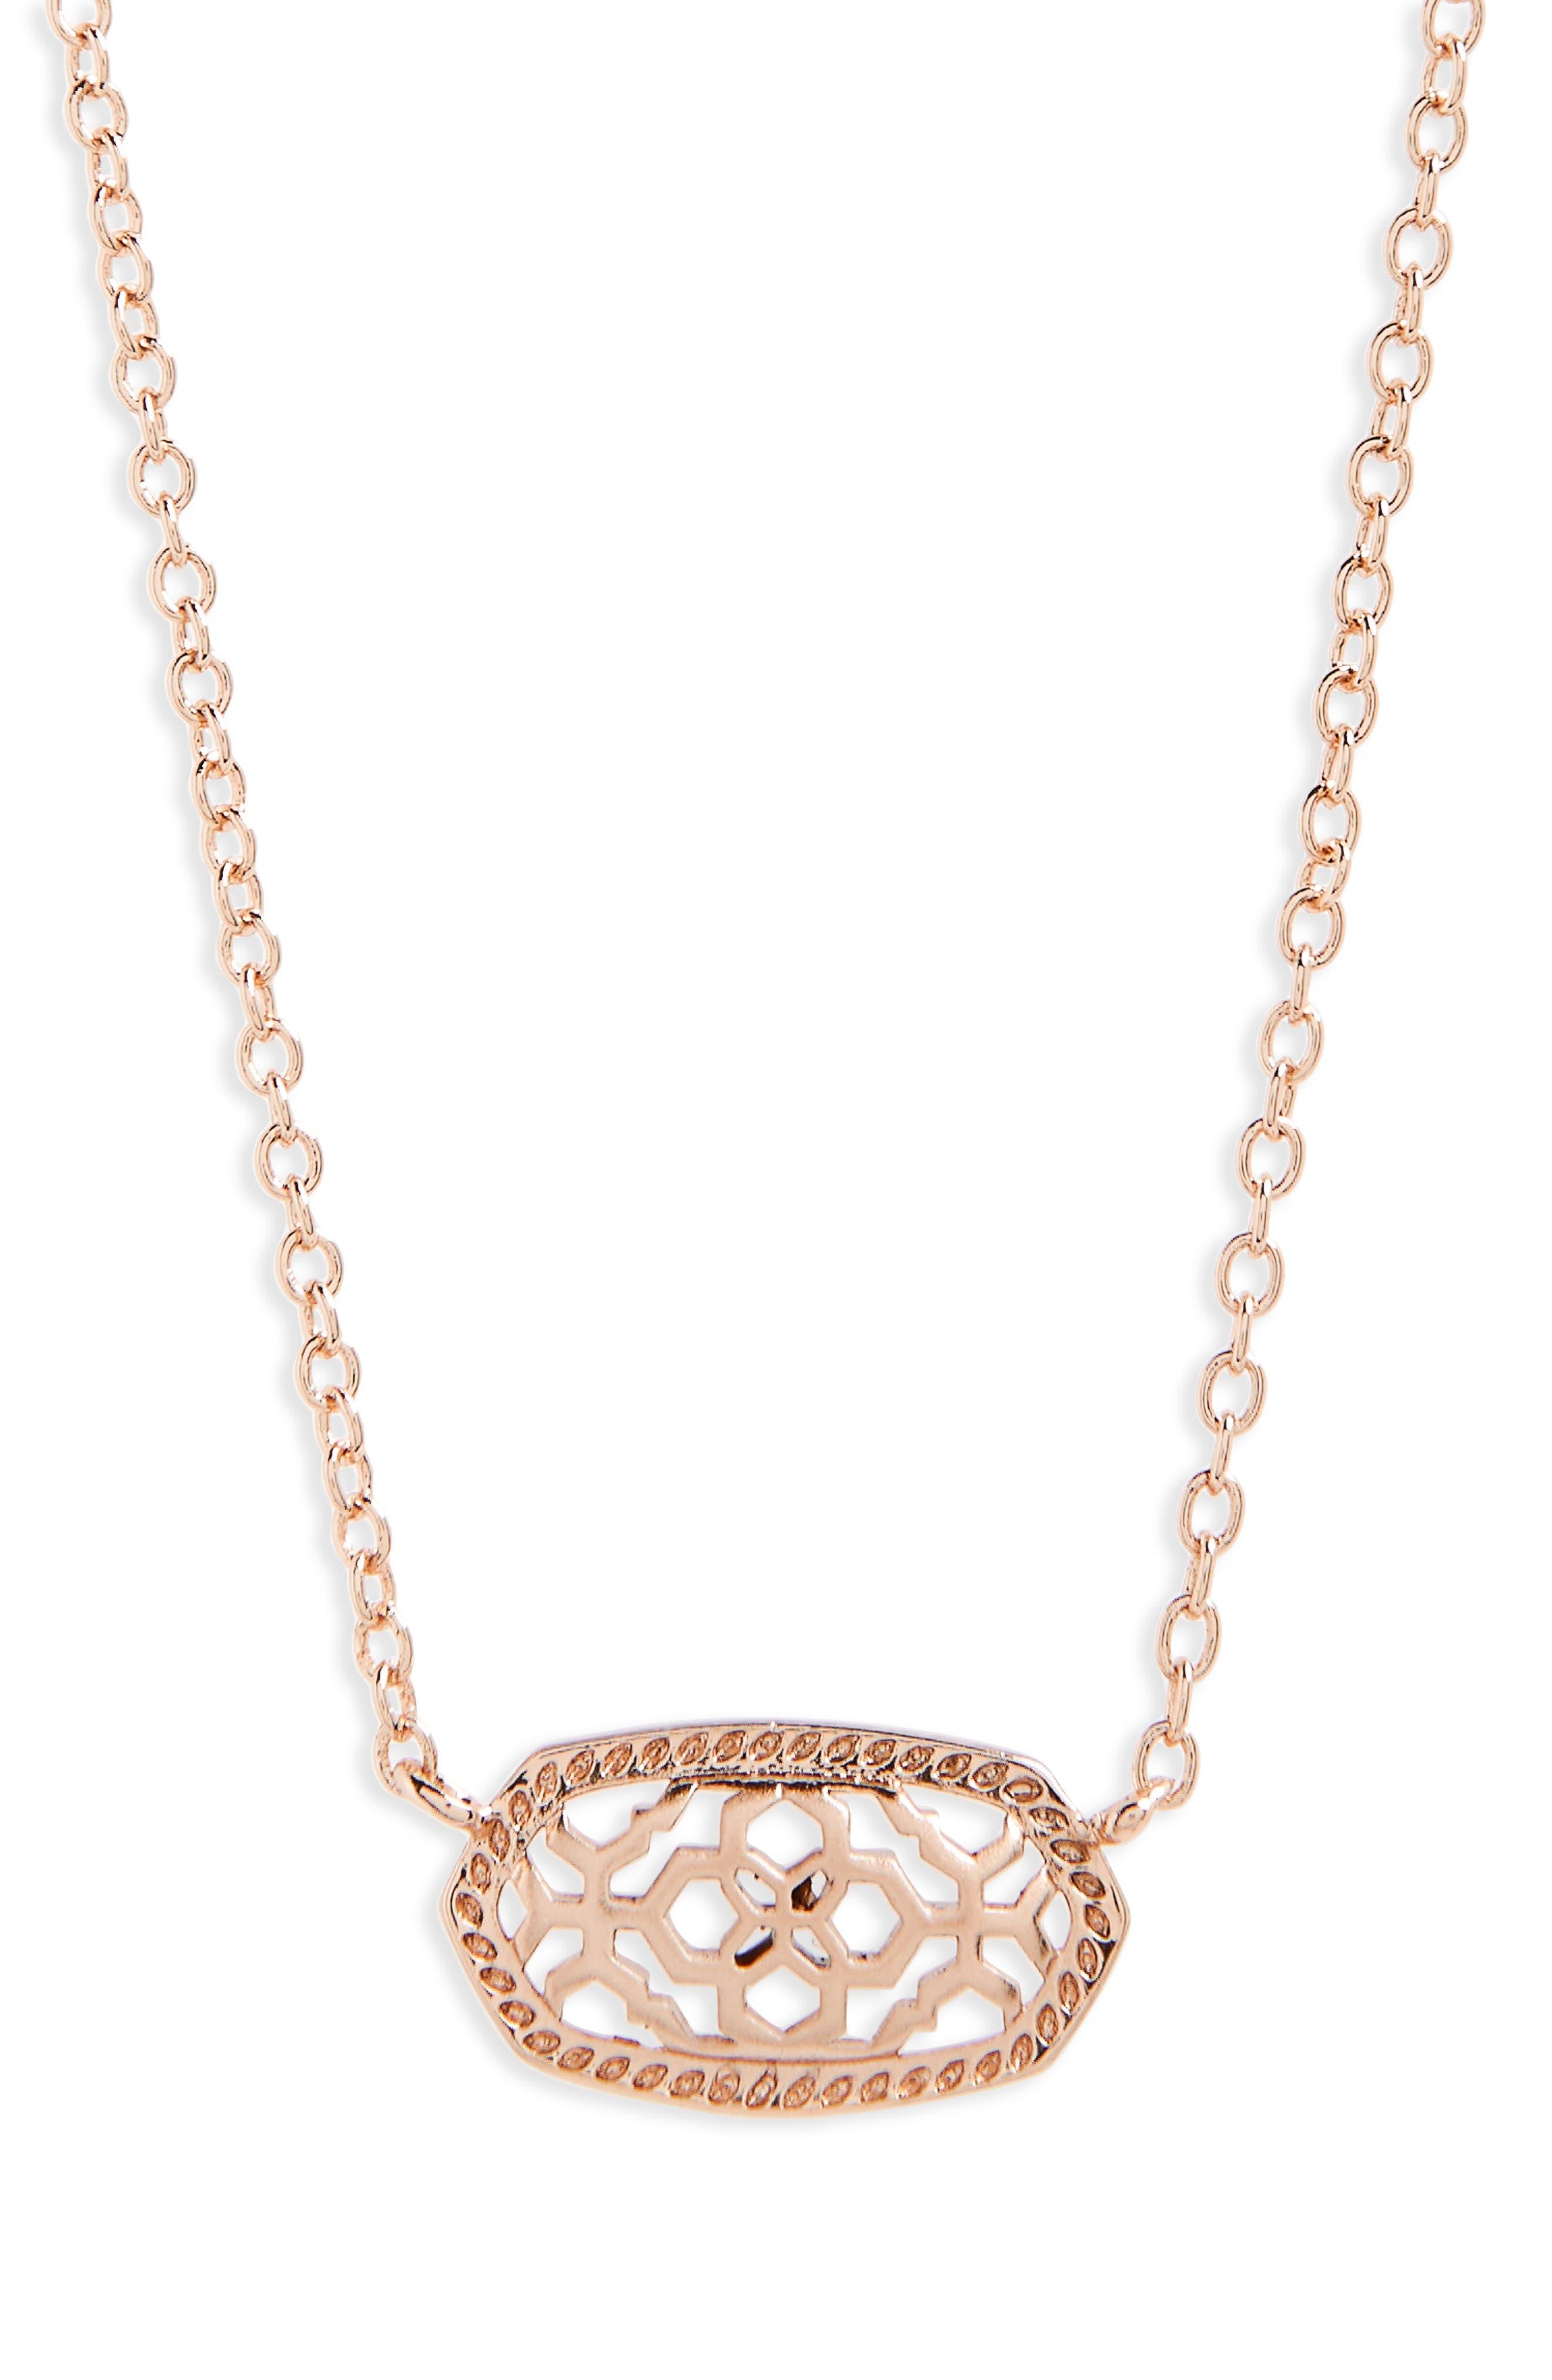 KENDRA SCOTT Elisa Filigree Pendant Necklace, Main, color, ROSE GOLD FILIGREE